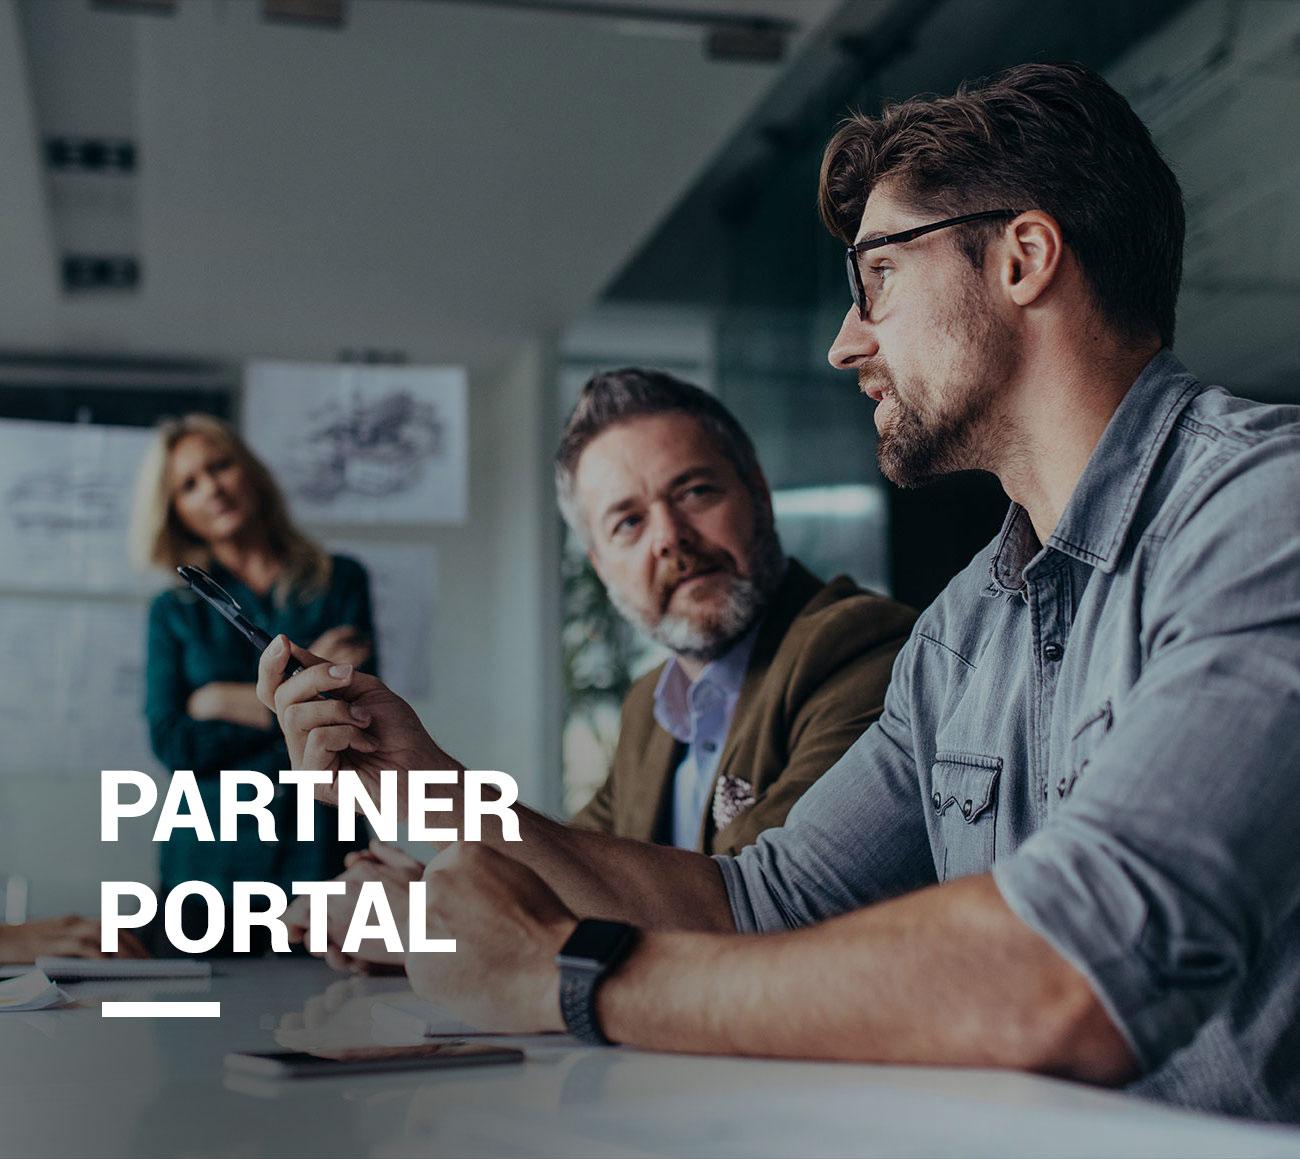 ASUS Partner Portal